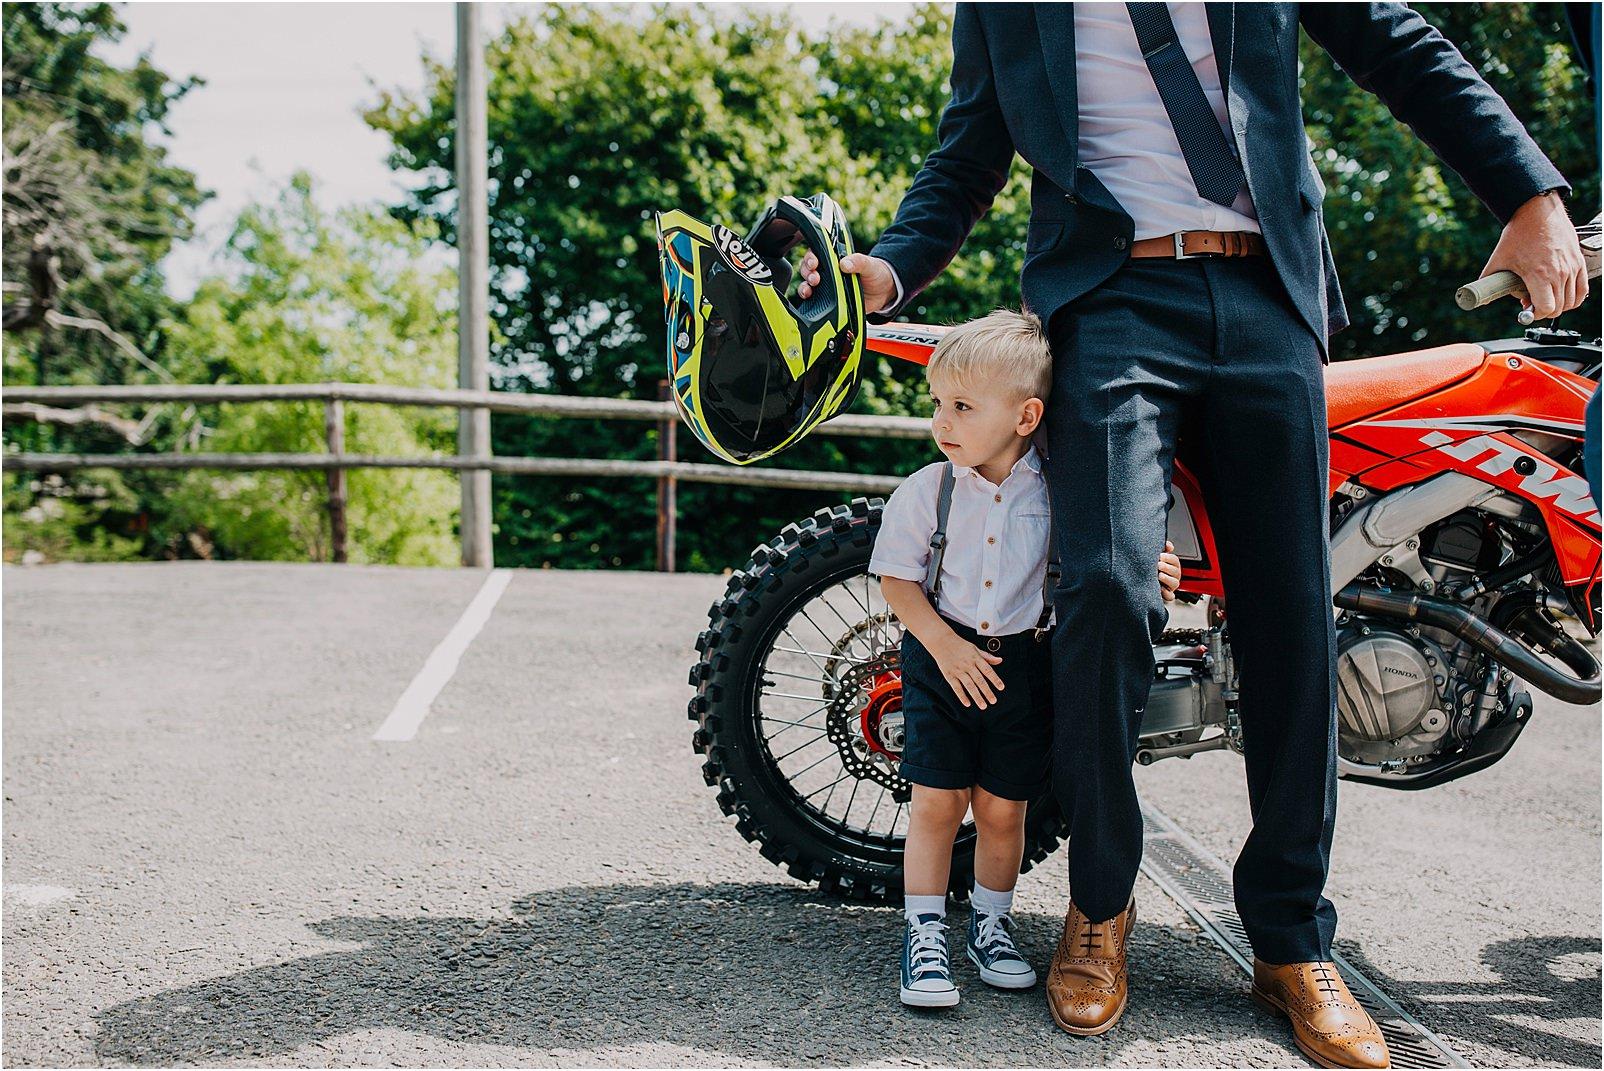 motorcross and young lad at Kingscote barn